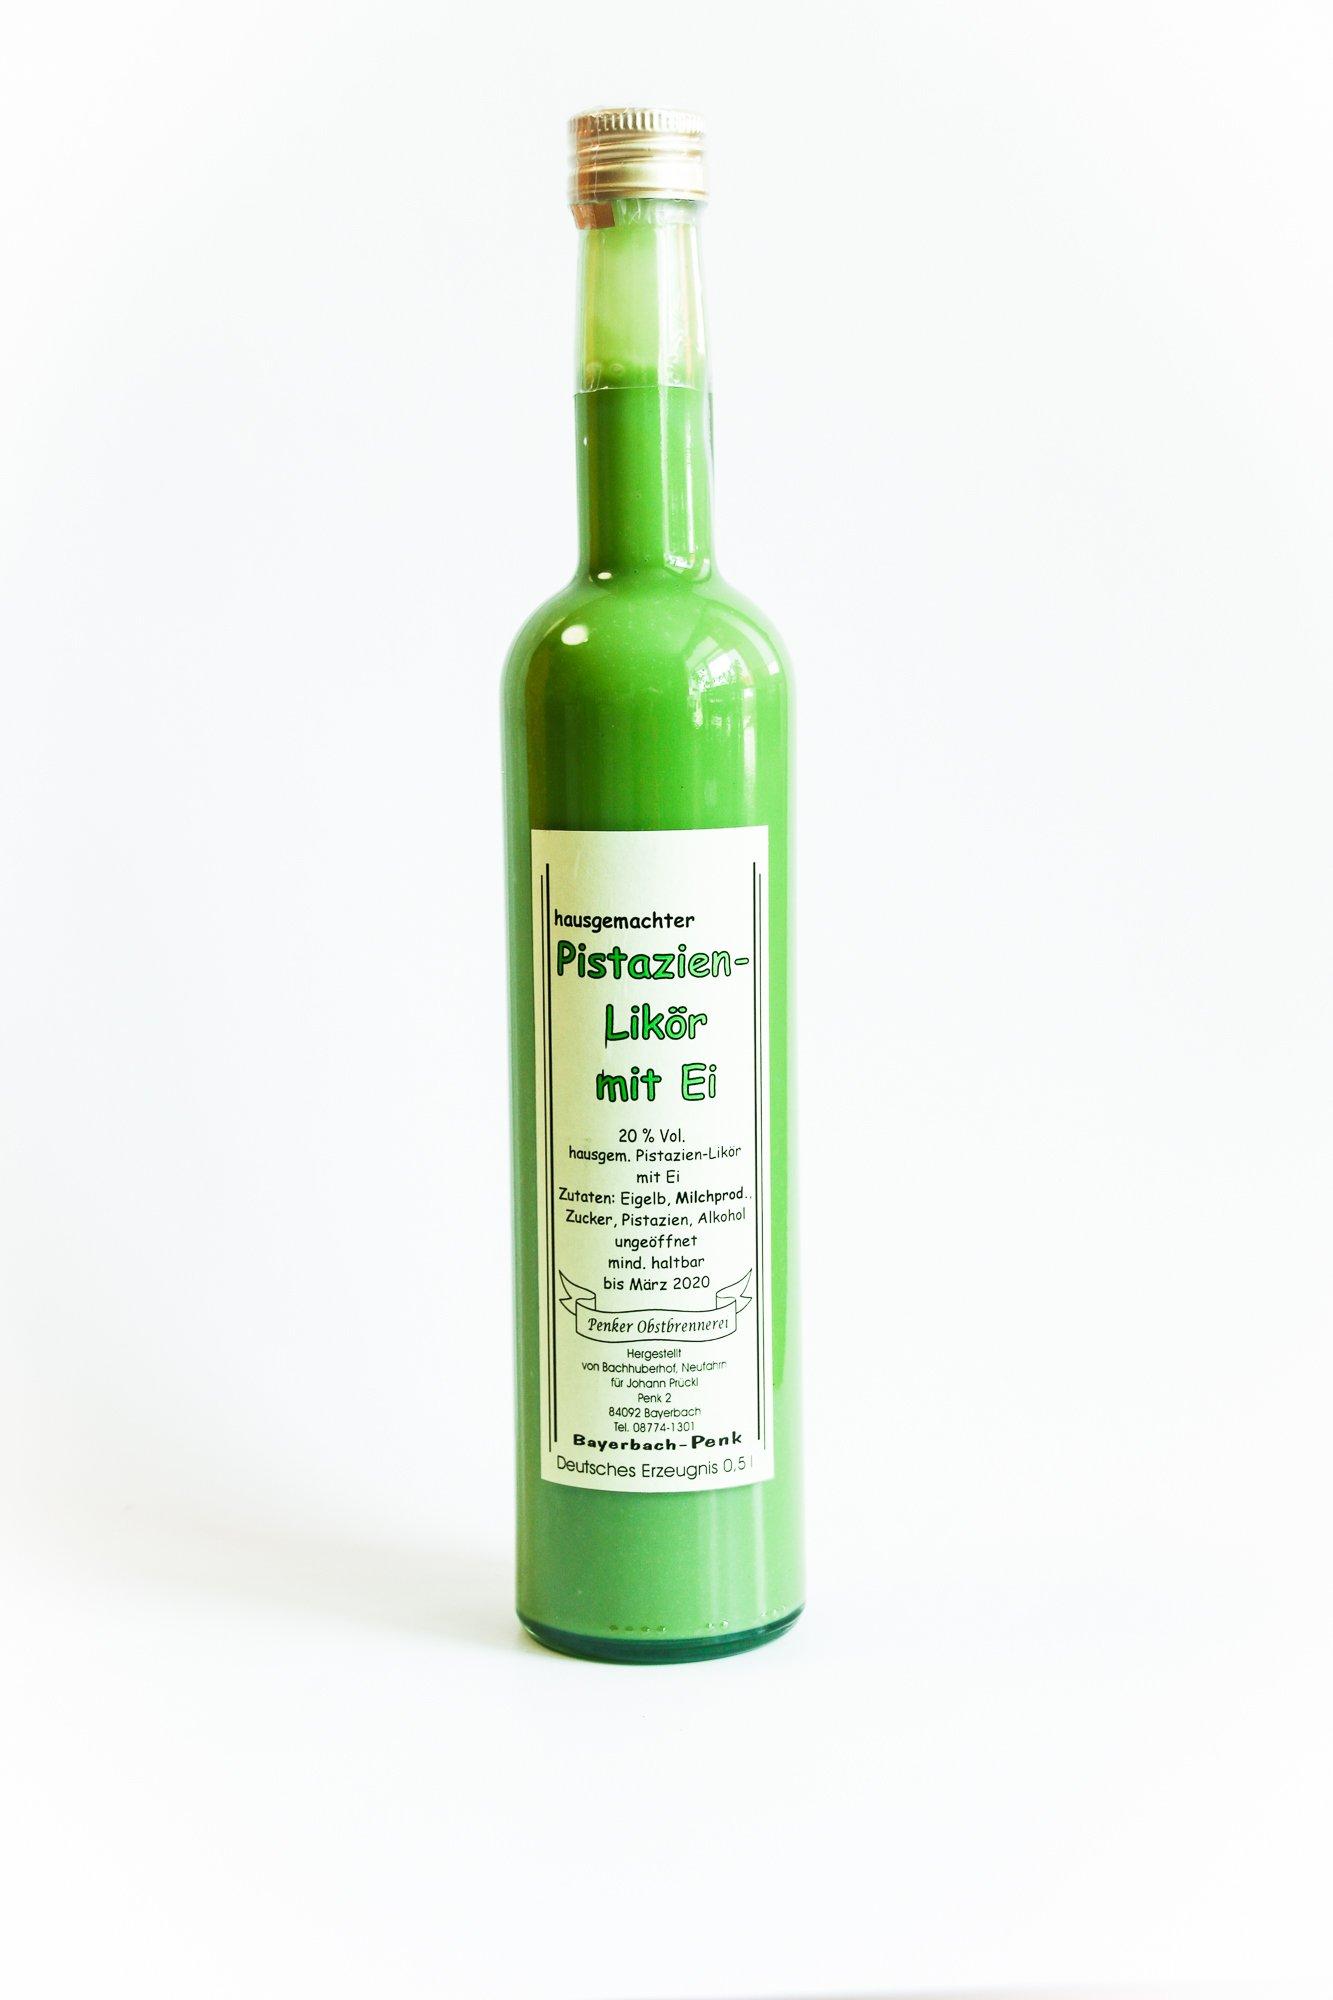 pistazienlikoer-05-gerad-penker-obstbrennerei